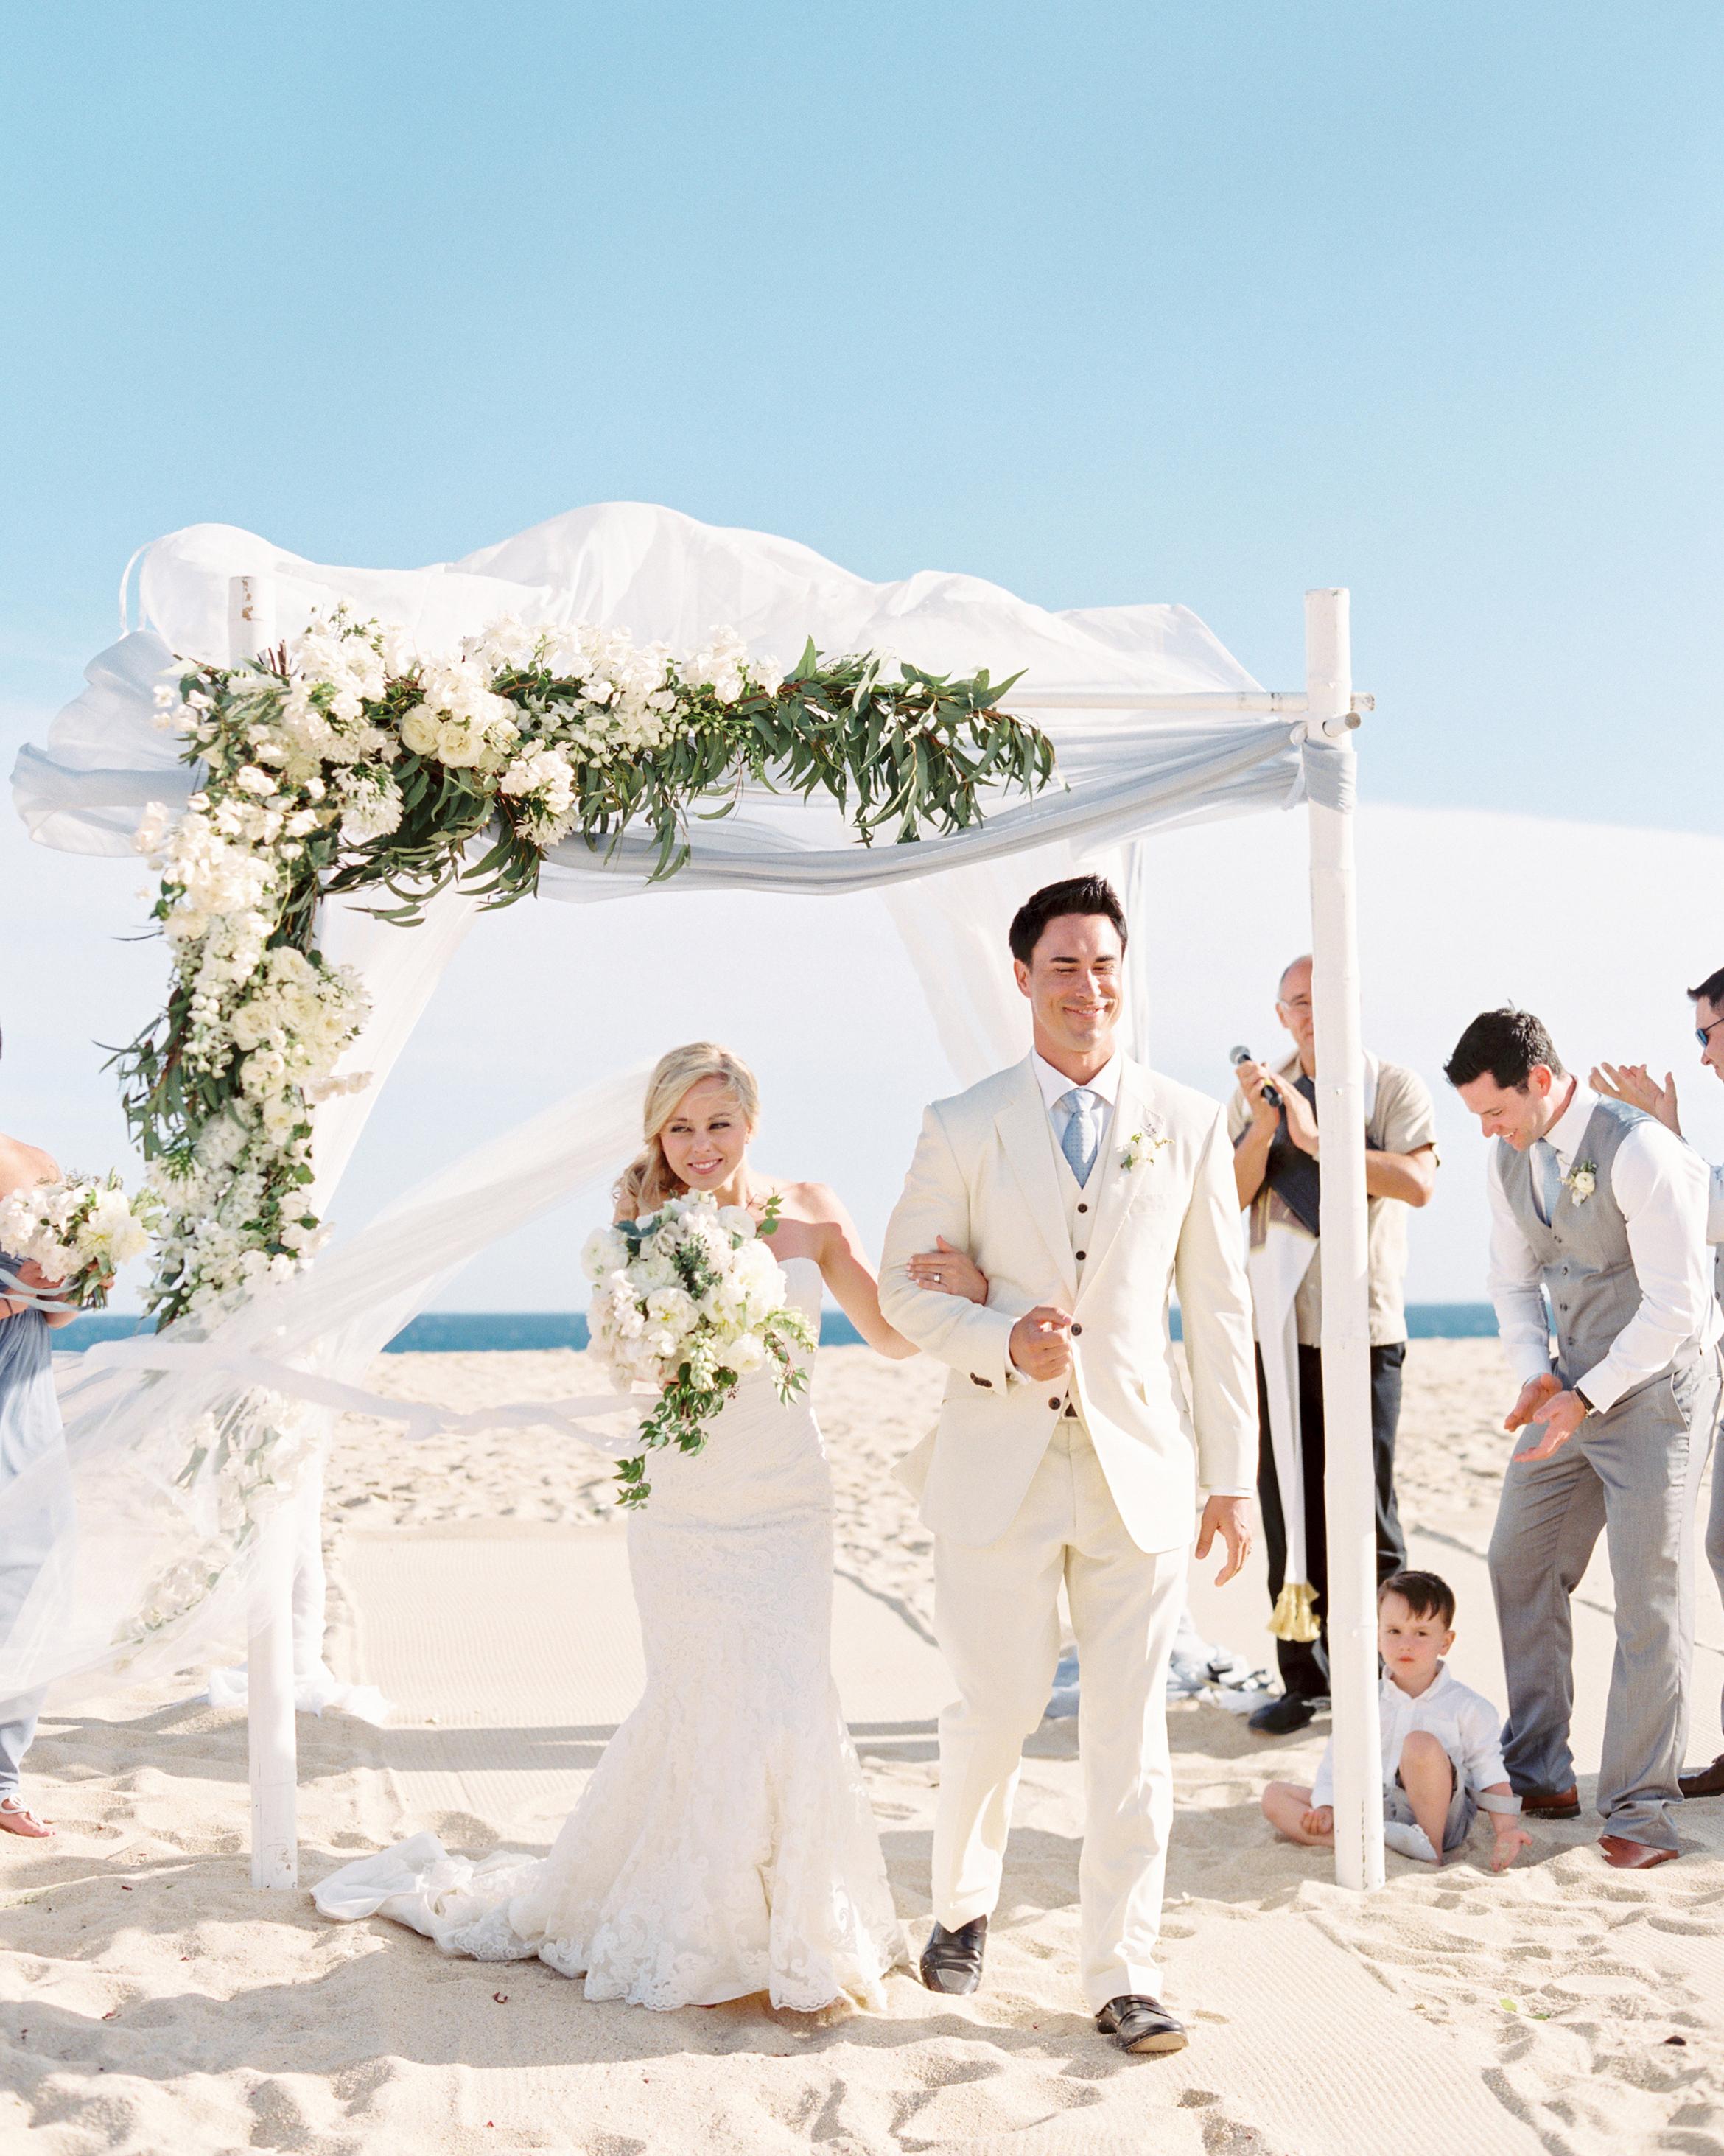 megan-jeremy-wedding-ceremony-21-s112680-0216.jpg